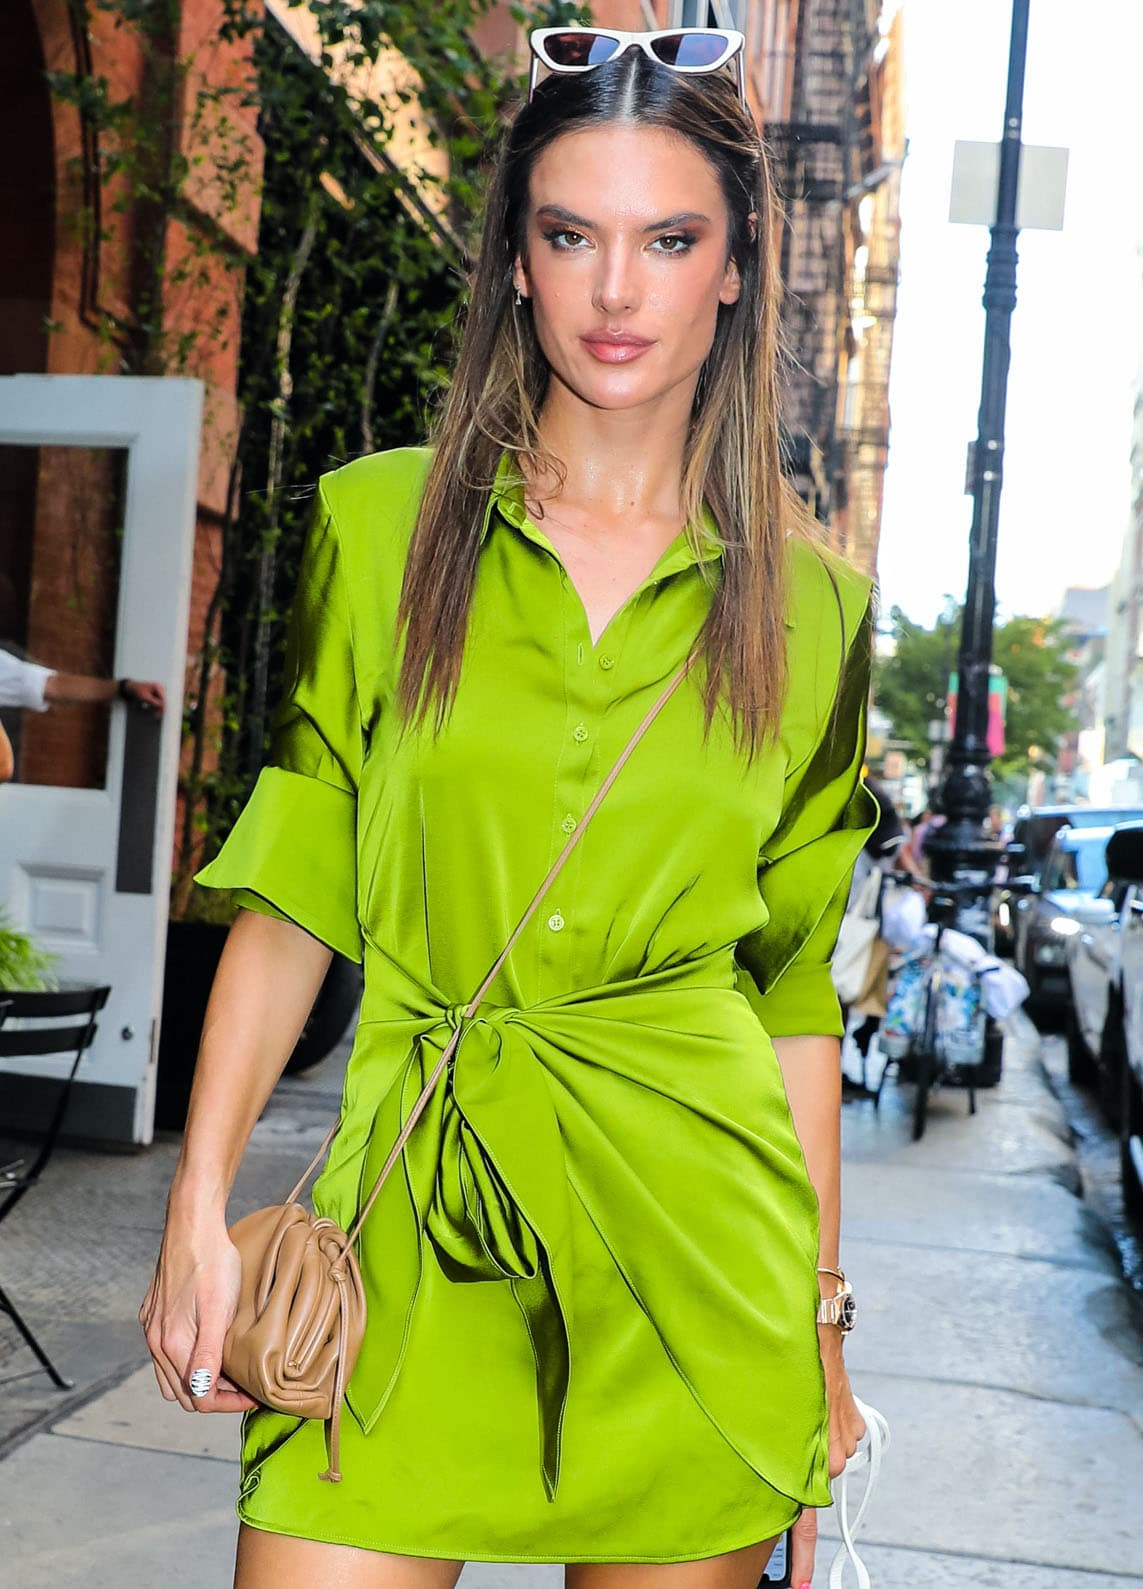 Alessandra Ambrosio wears sleek straight damp hair and smokey eye-makeup